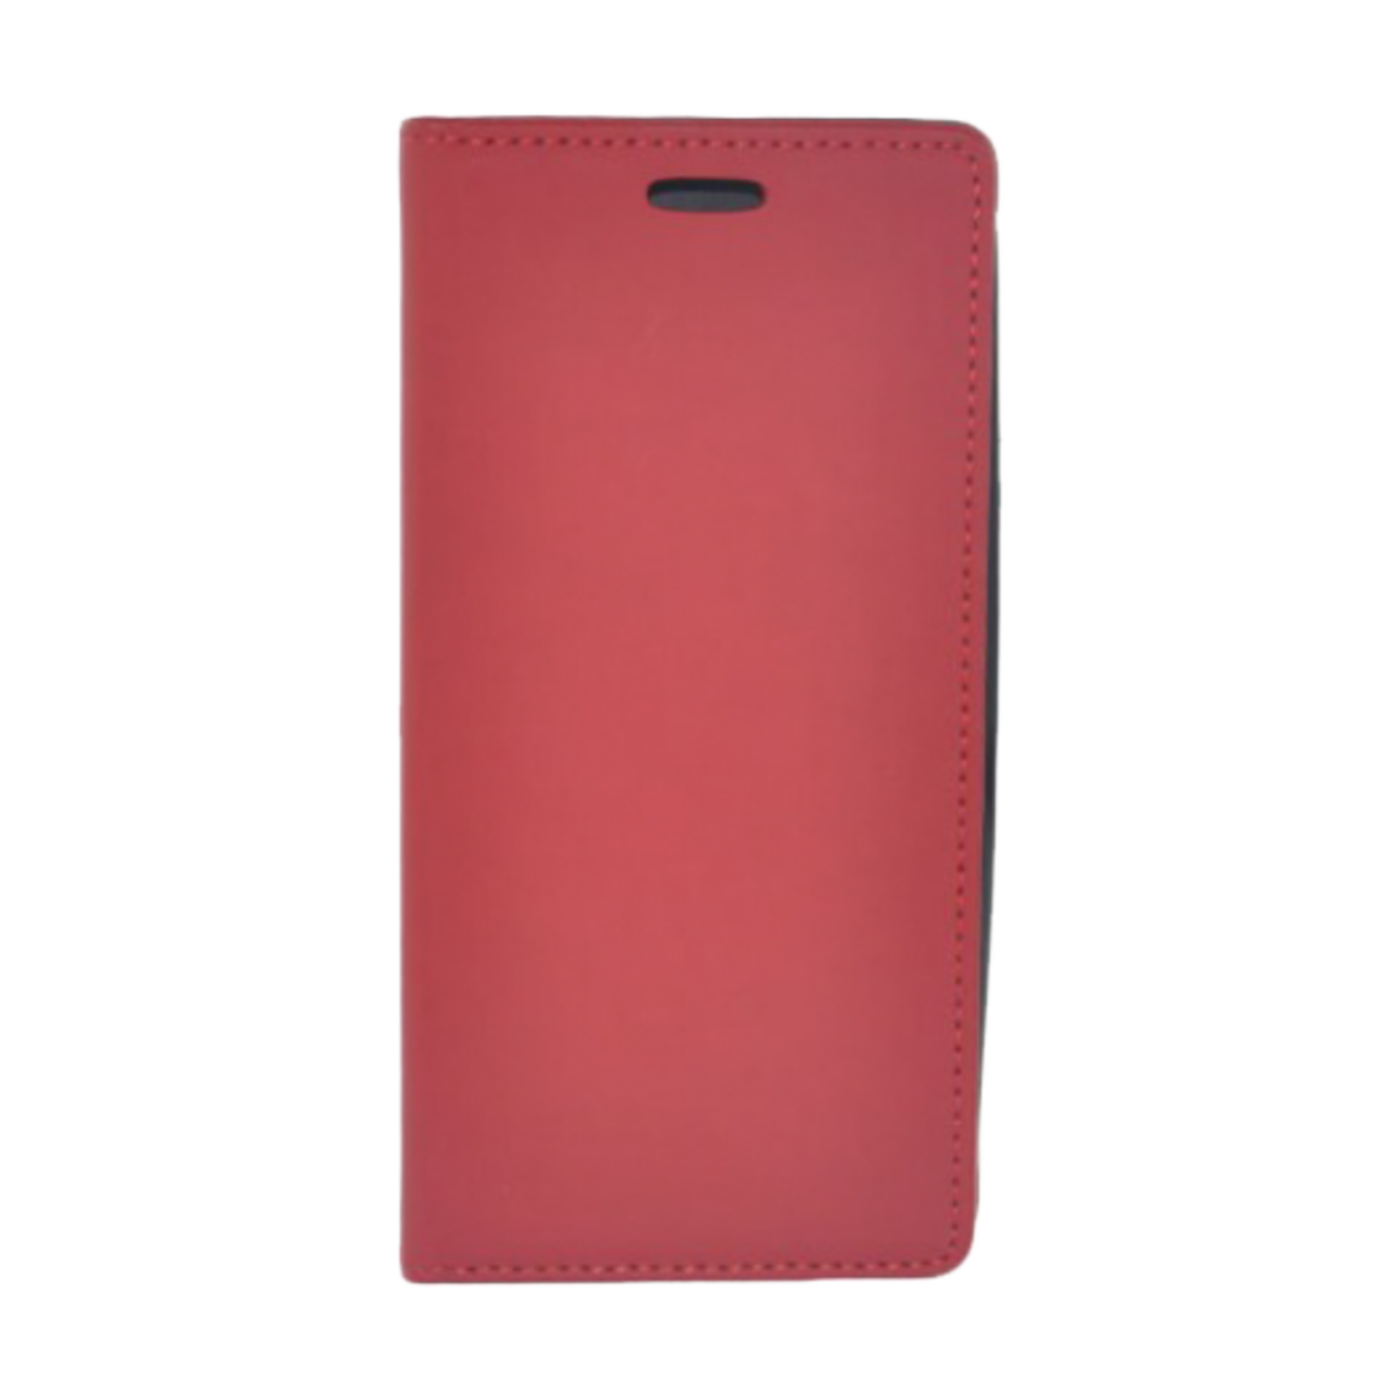 Futrola za mobitel Sony XA, Flip, crvena